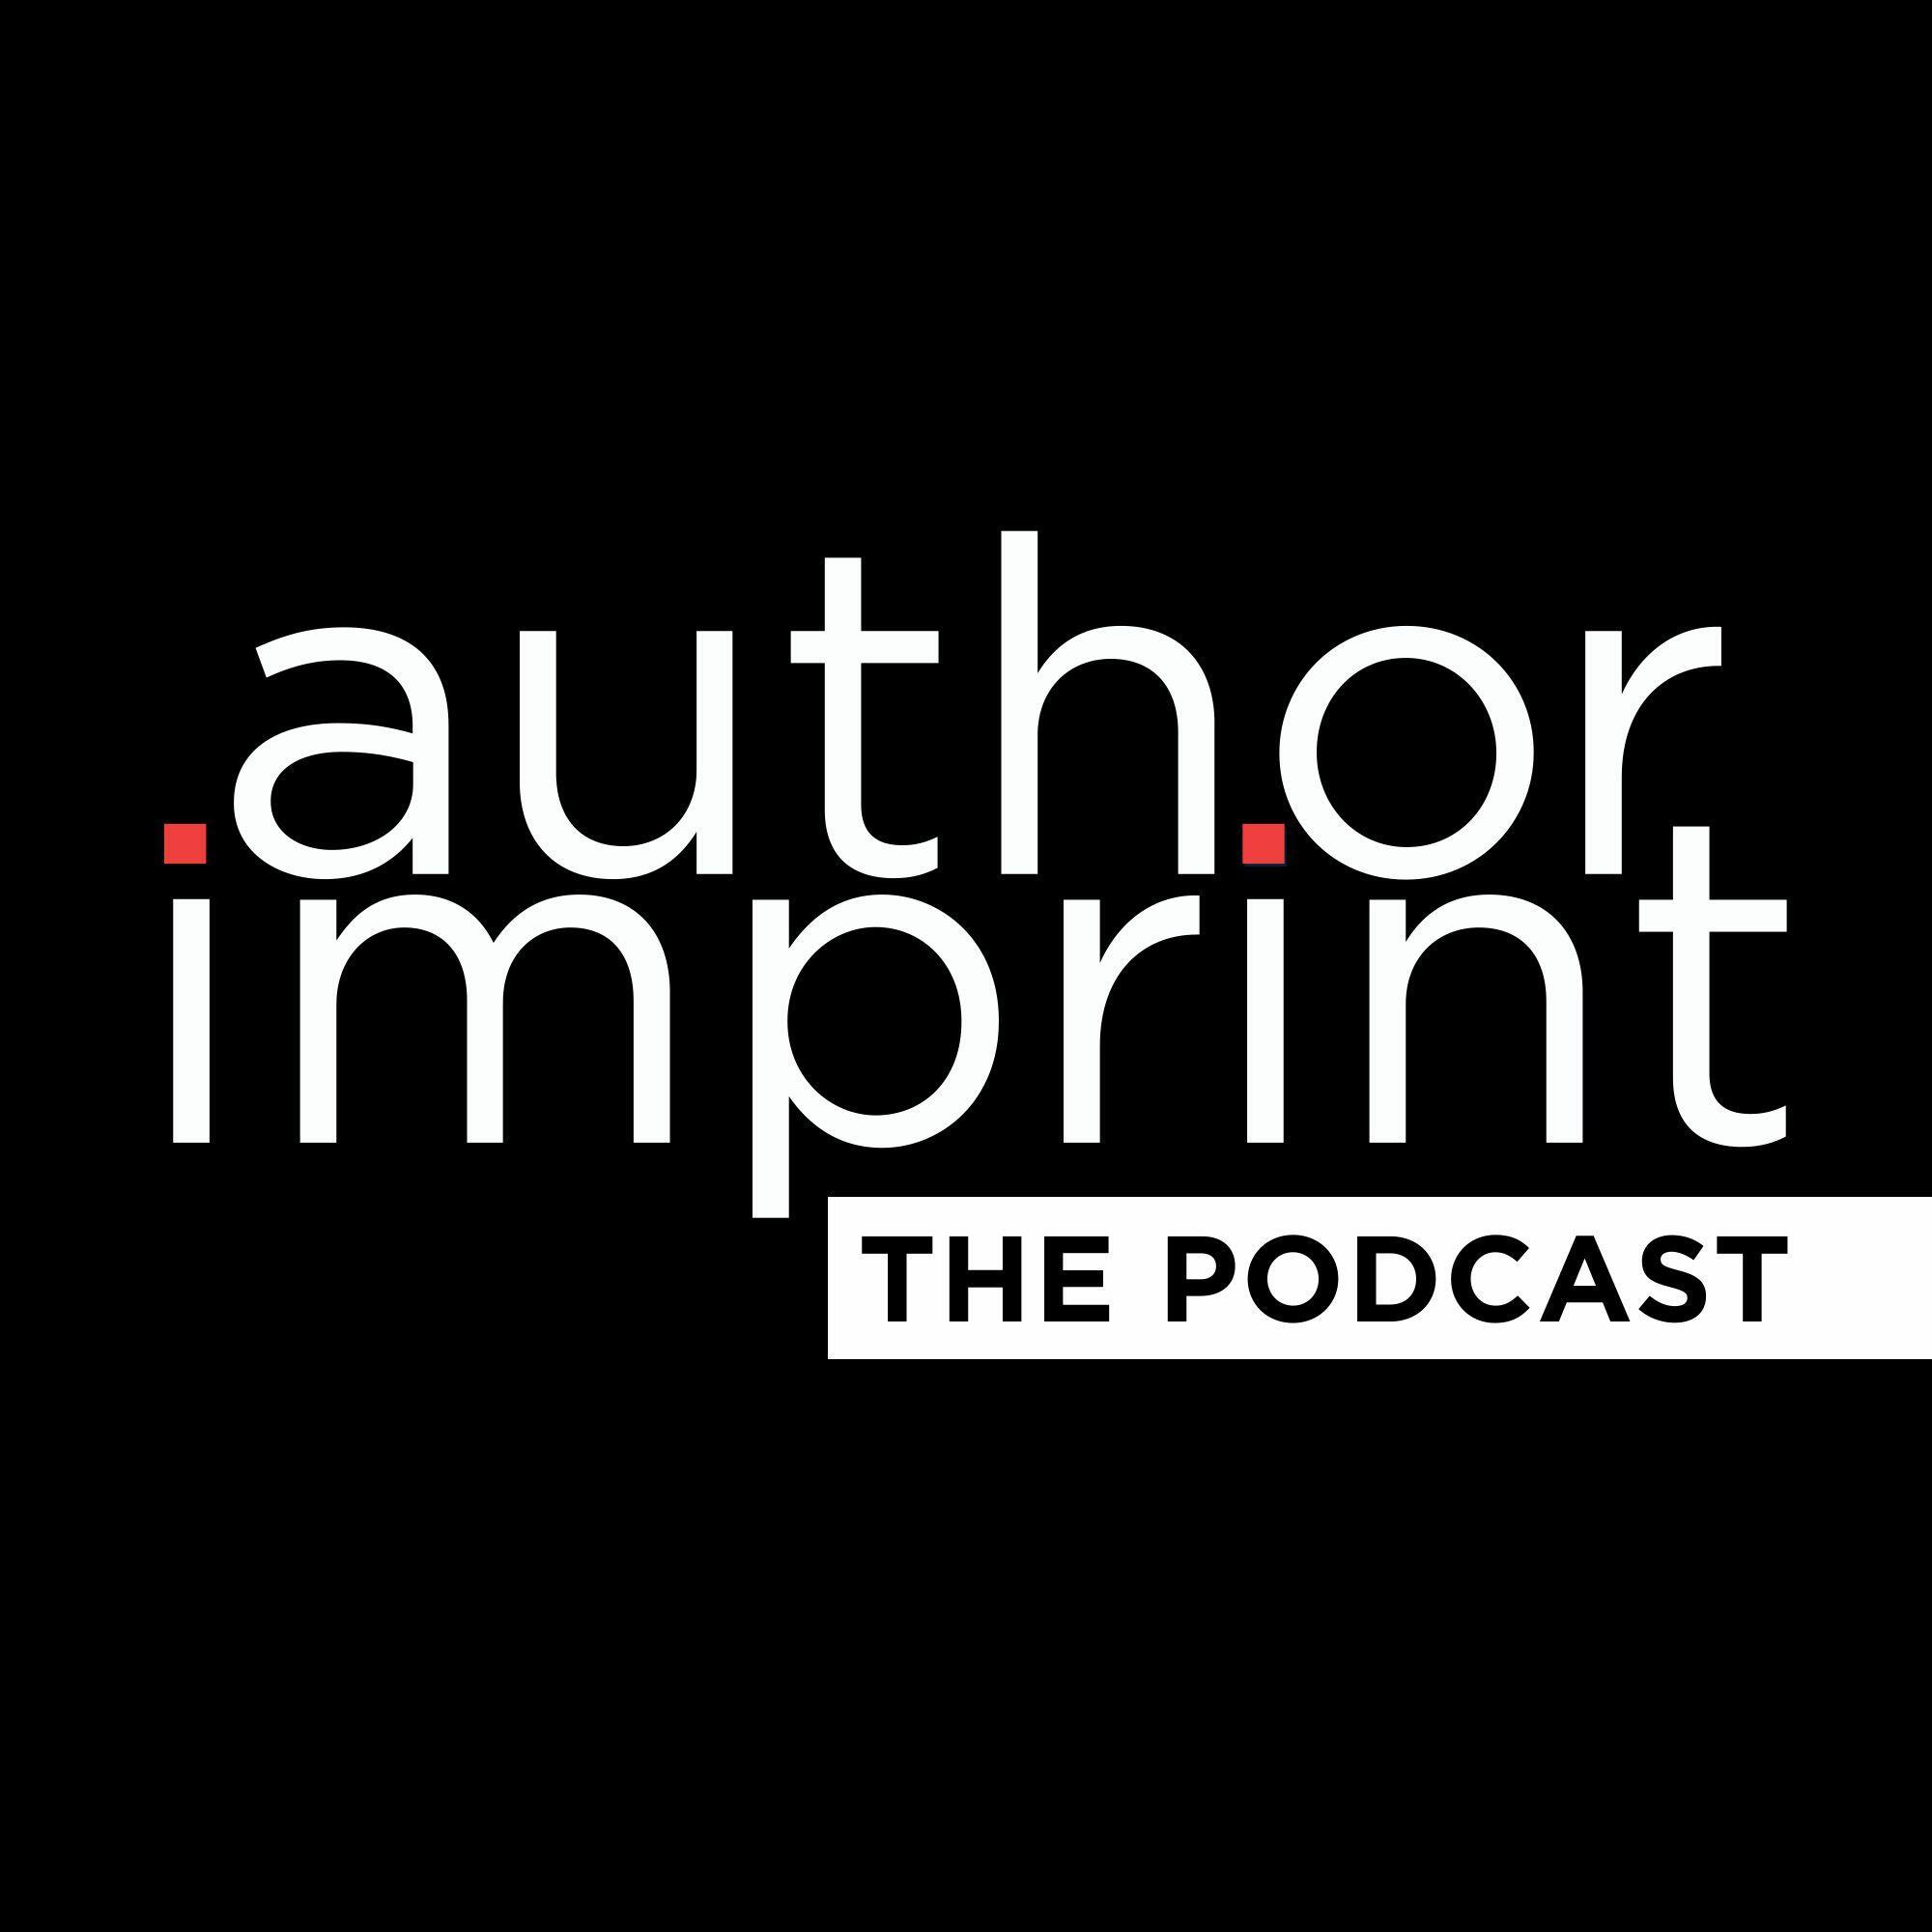 Author Imprint: The Podcast